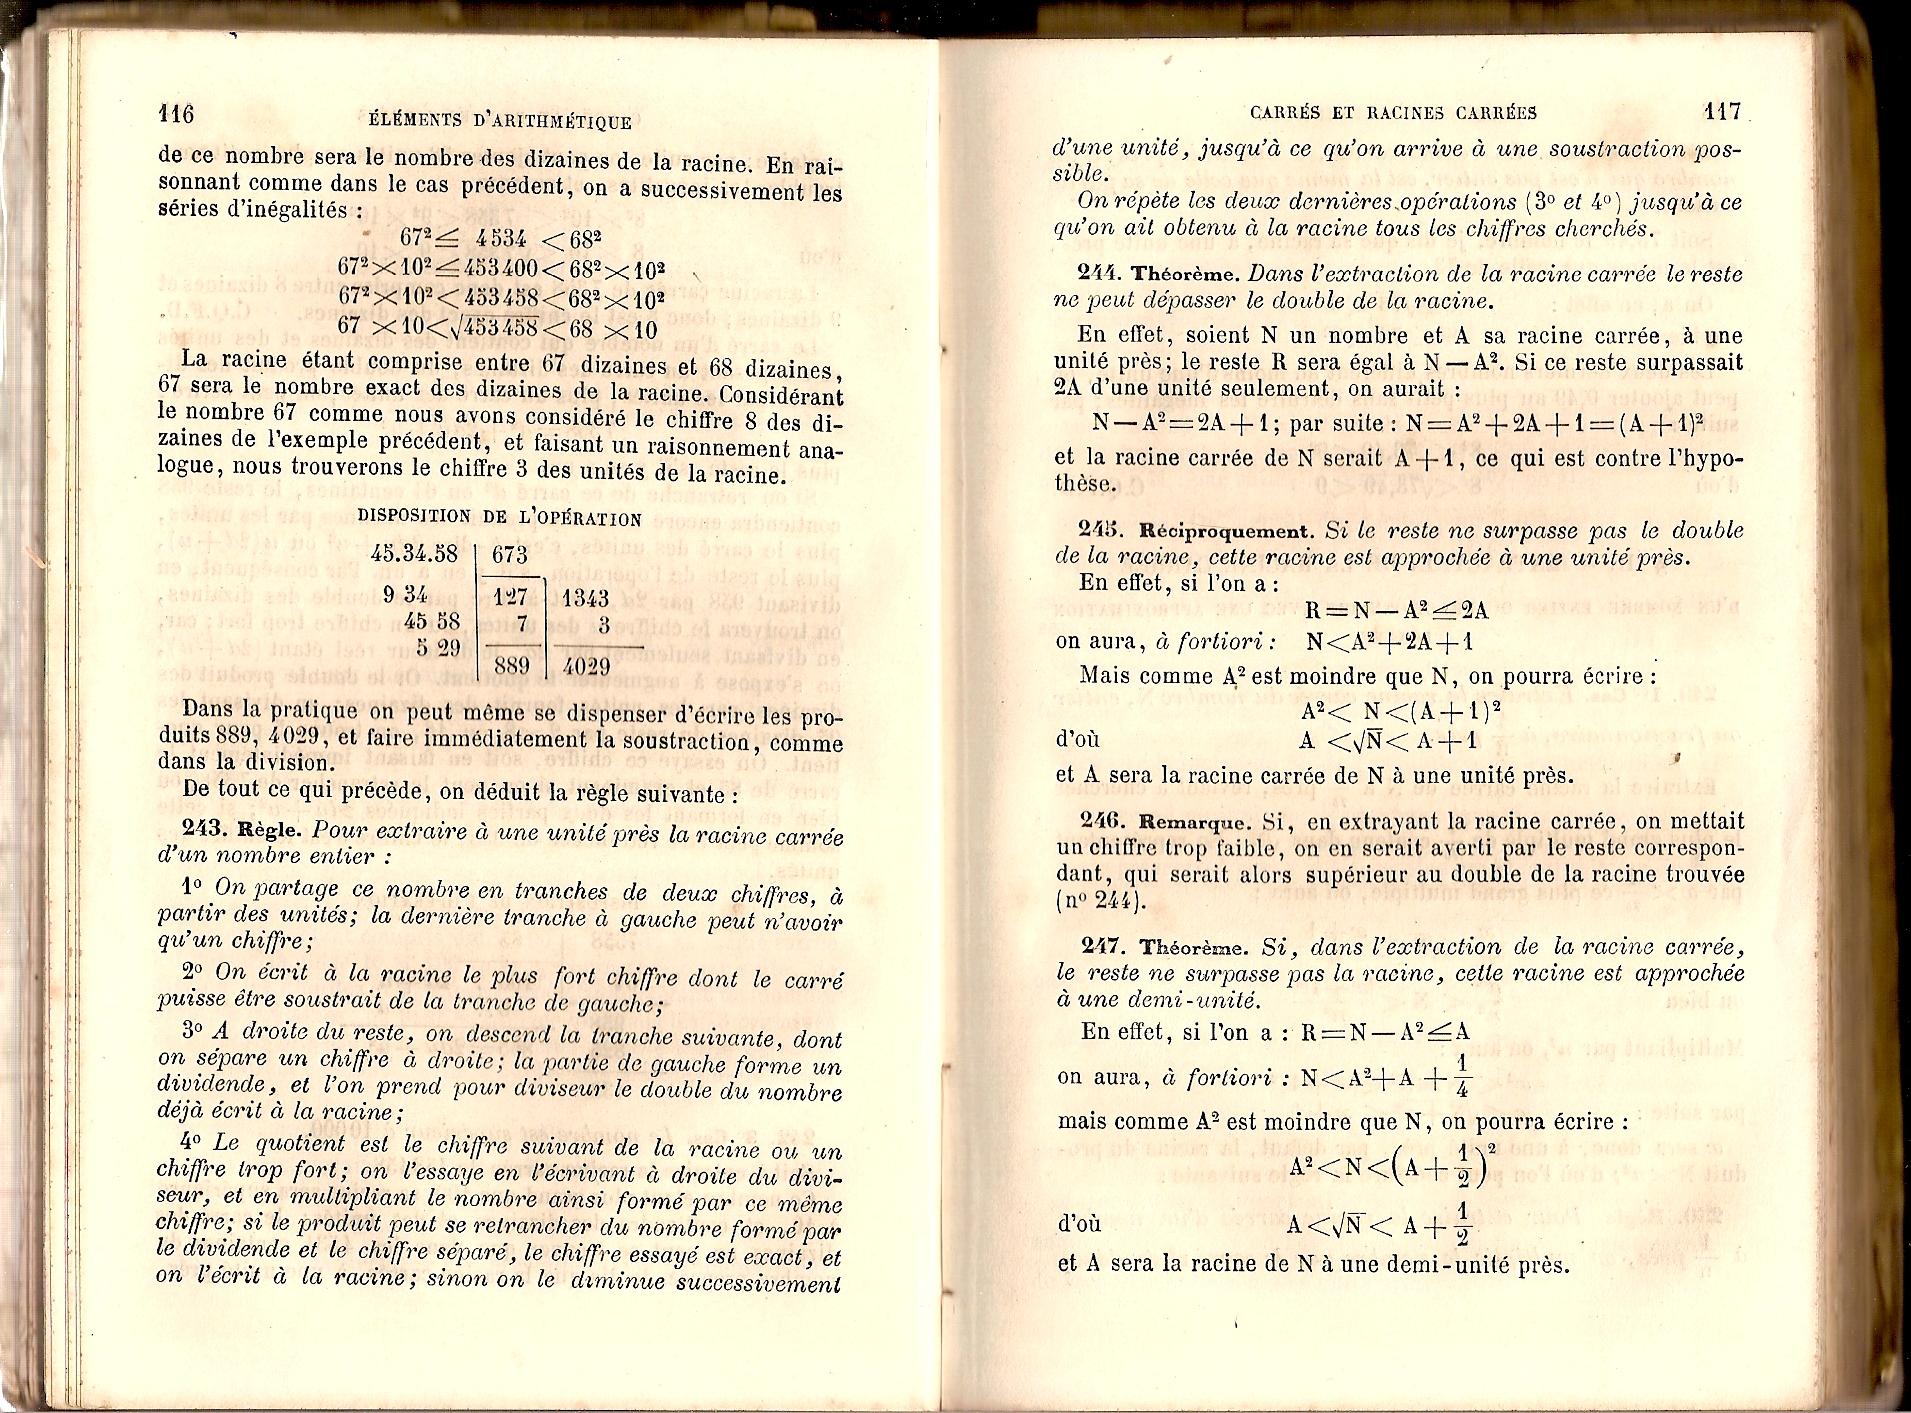 devoir maison de math 3eme racine carree